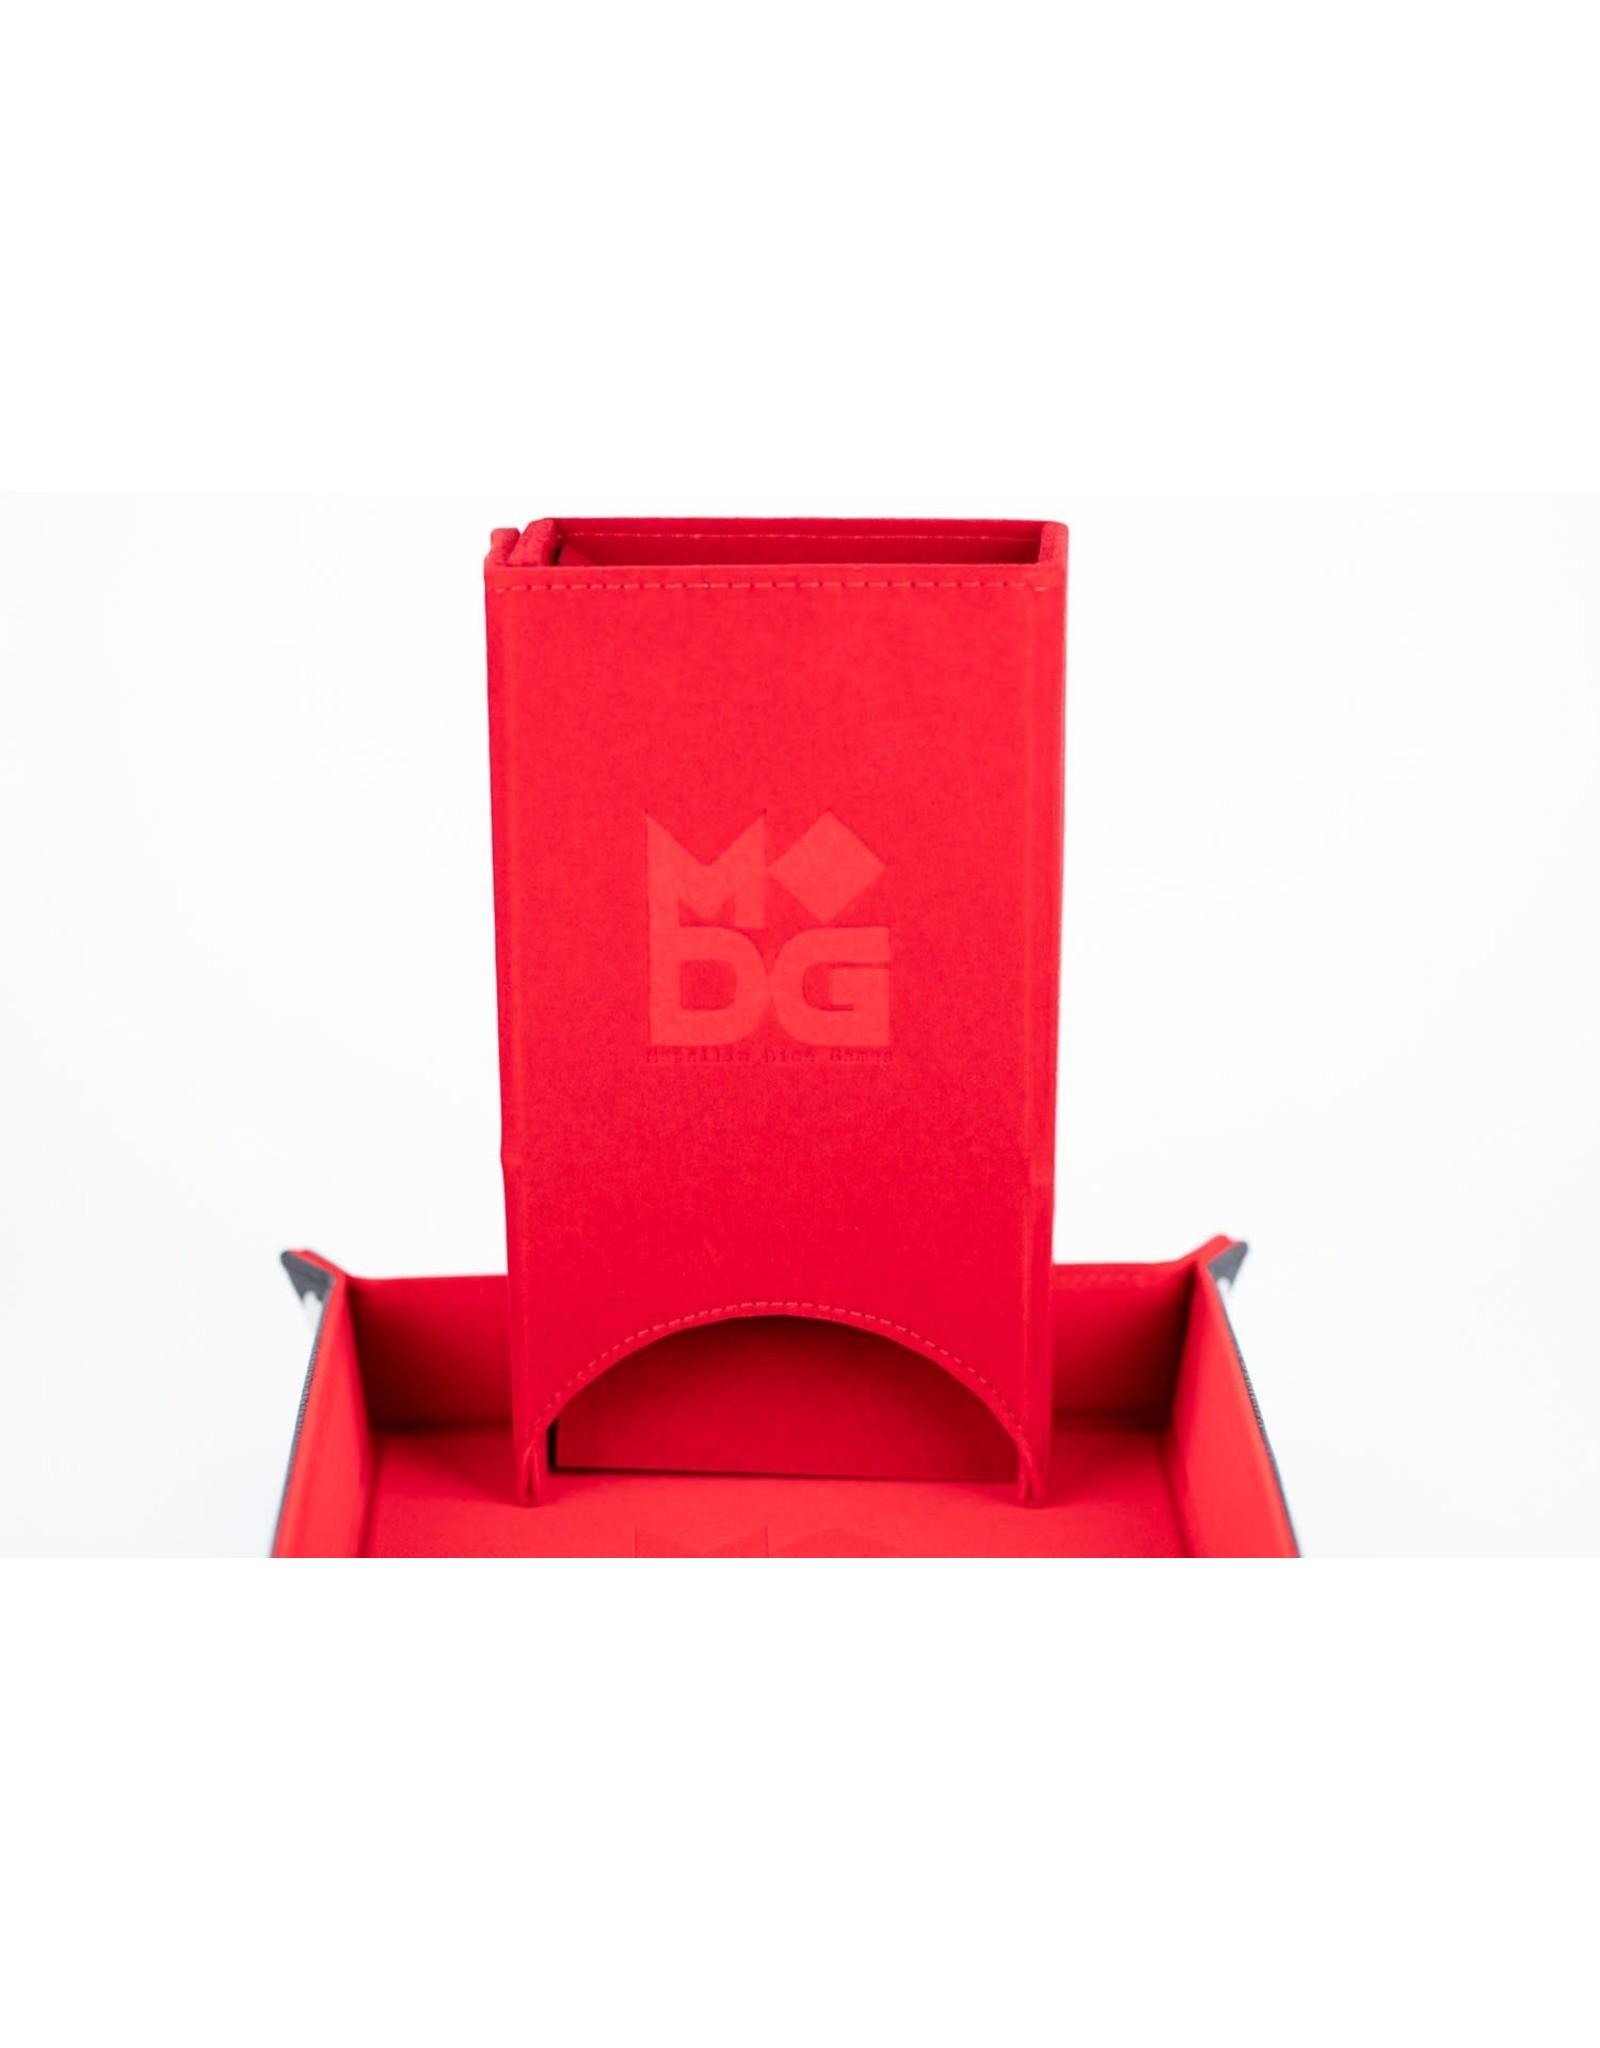 Metallic Dice Games Velvet Fold Up Dice Tower: Red